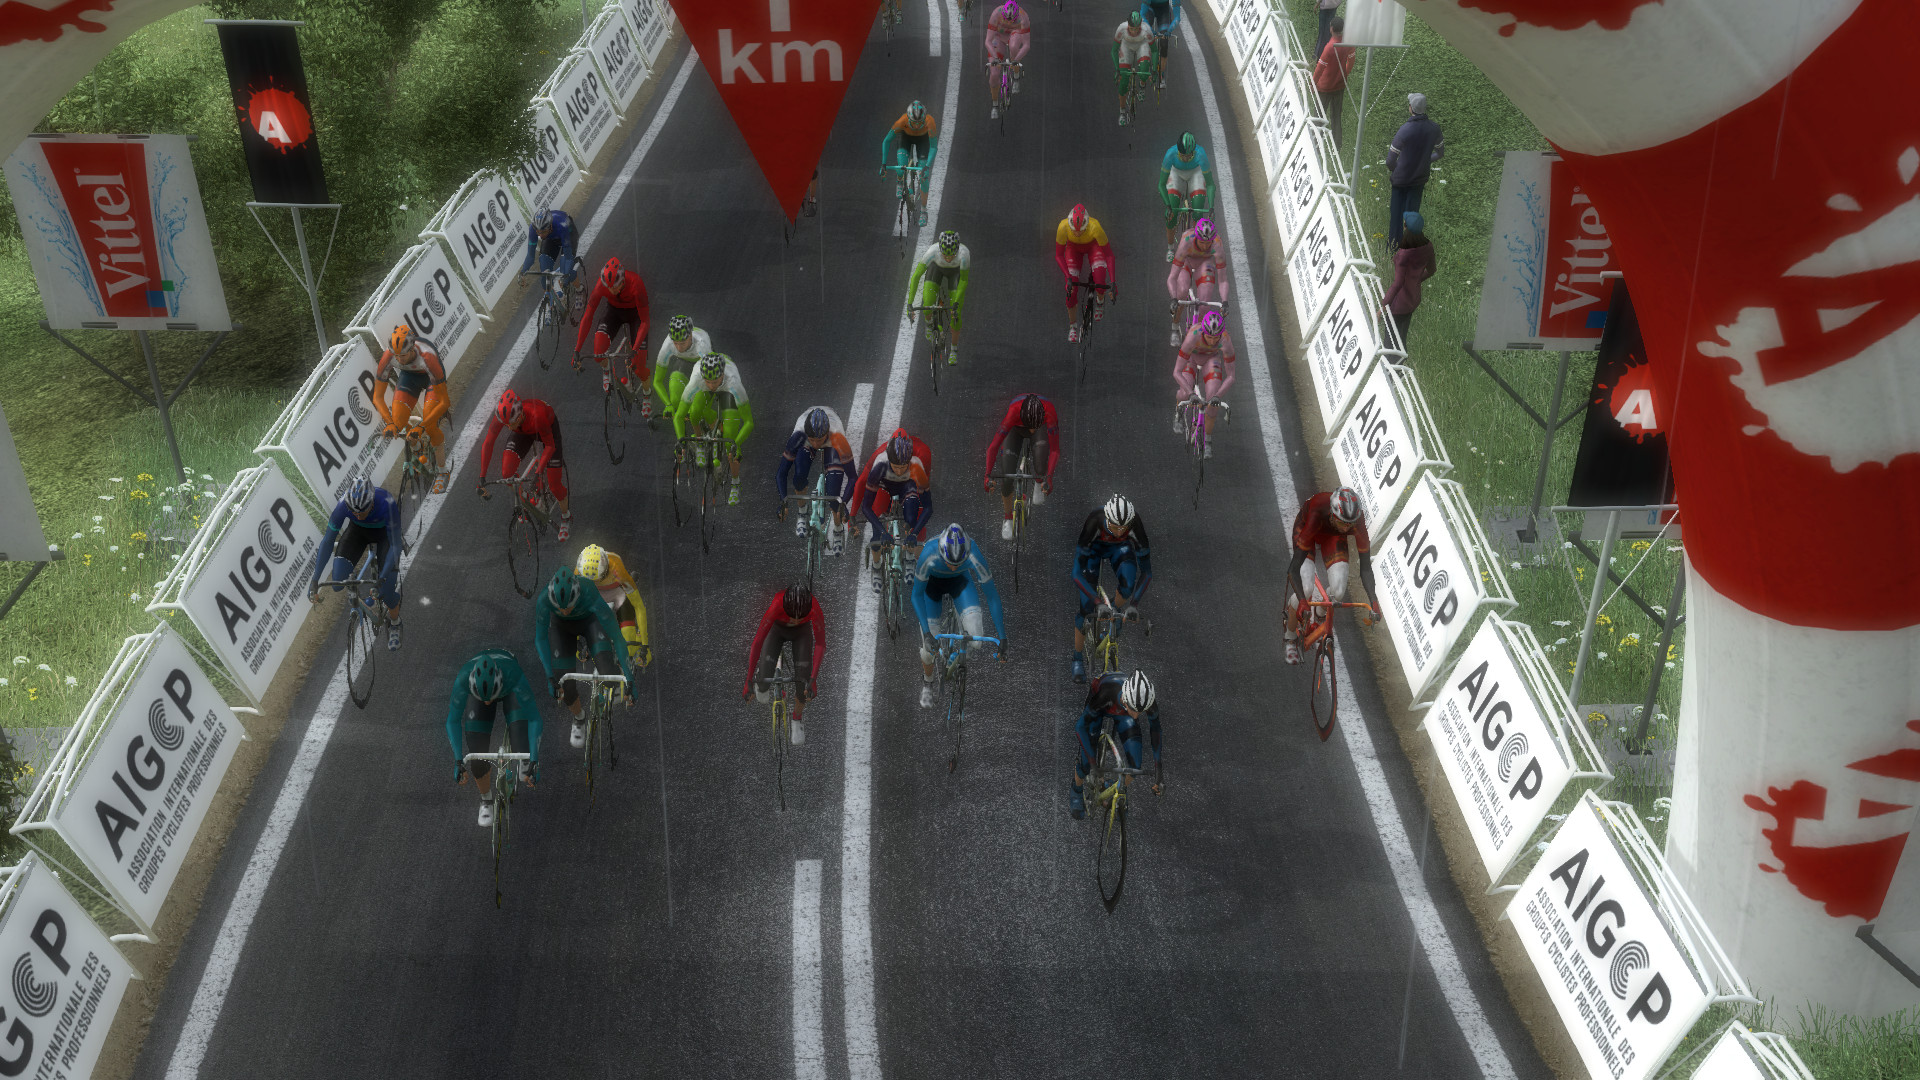 pcmdaily.com/images/mg/2019/Races/PTHC/Pologne/E5/23.jpg